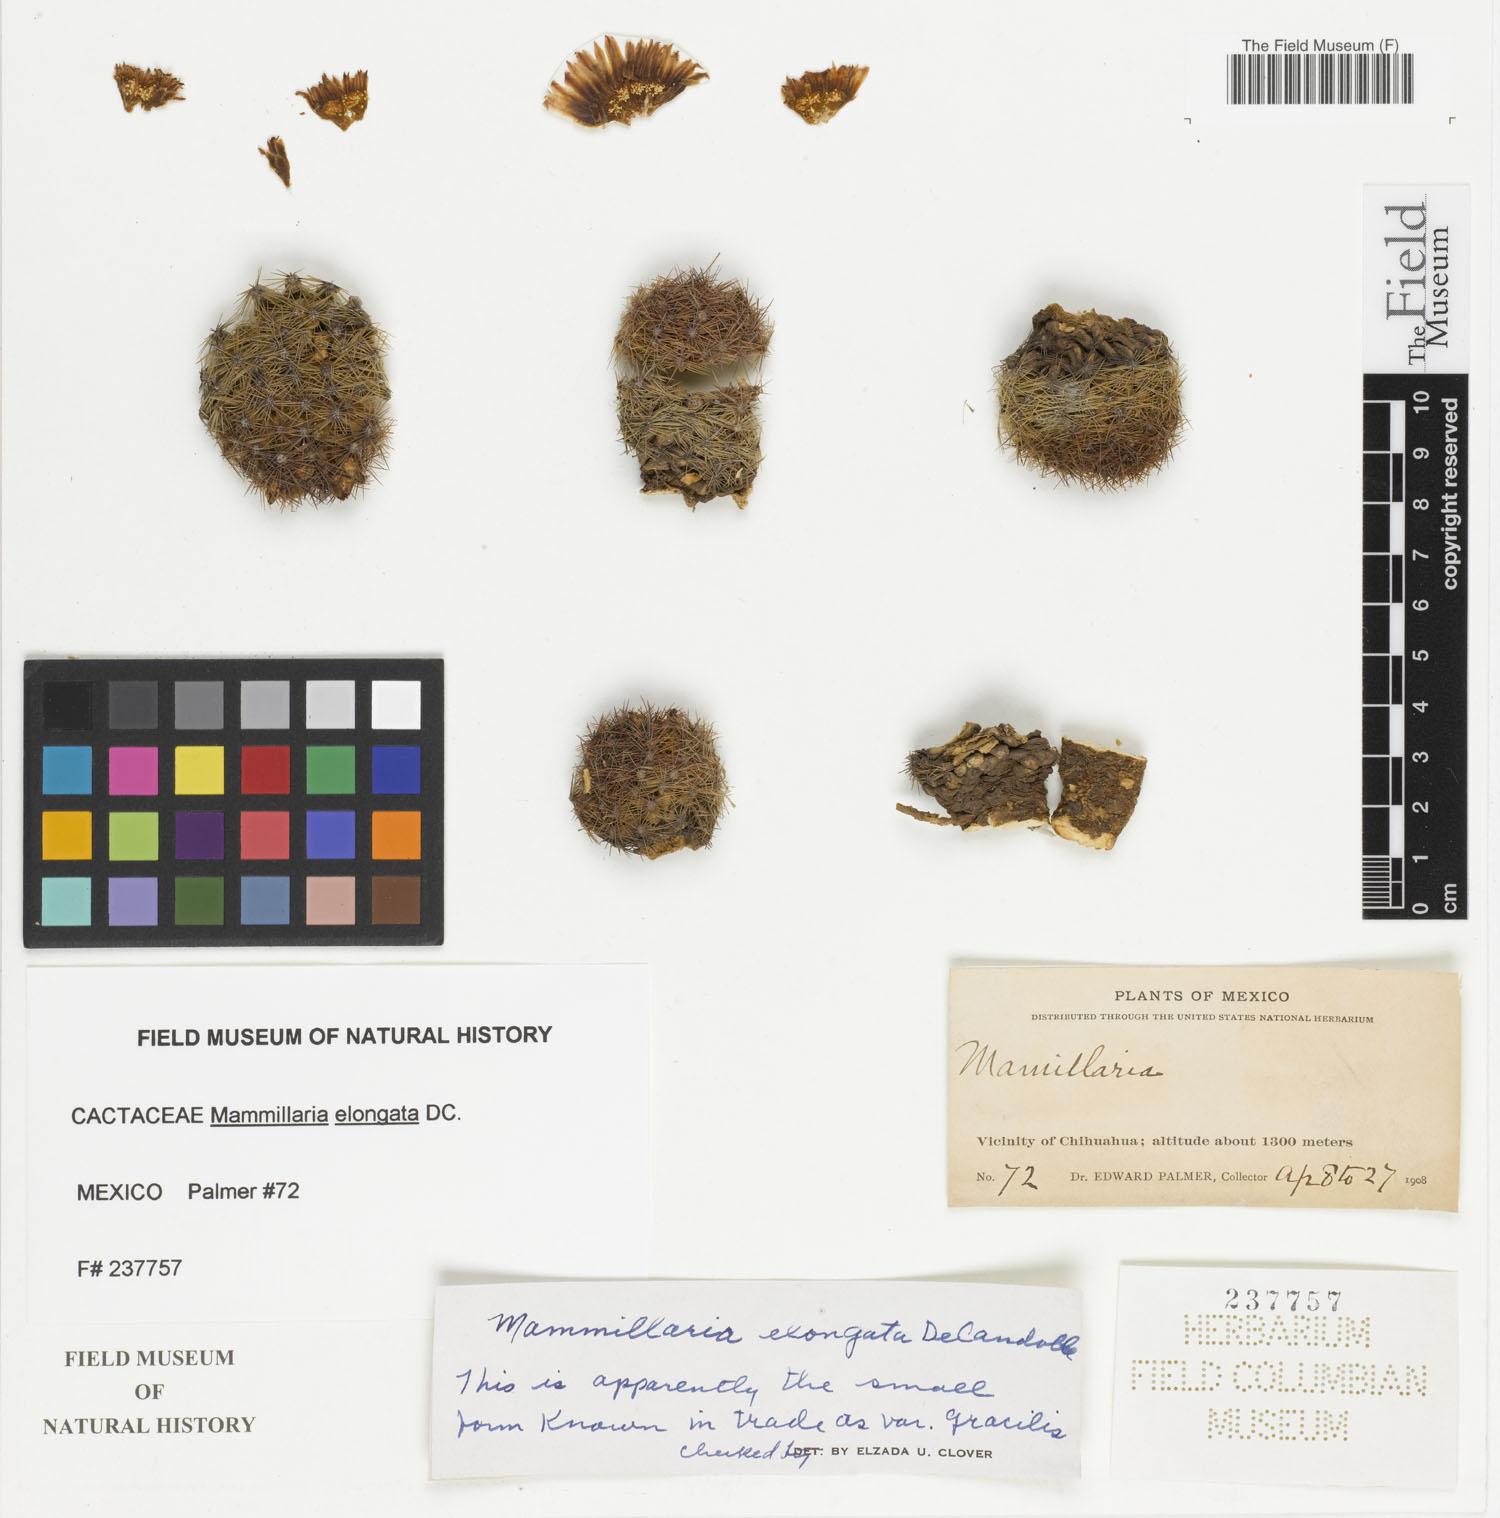 Mammillaria elongata image